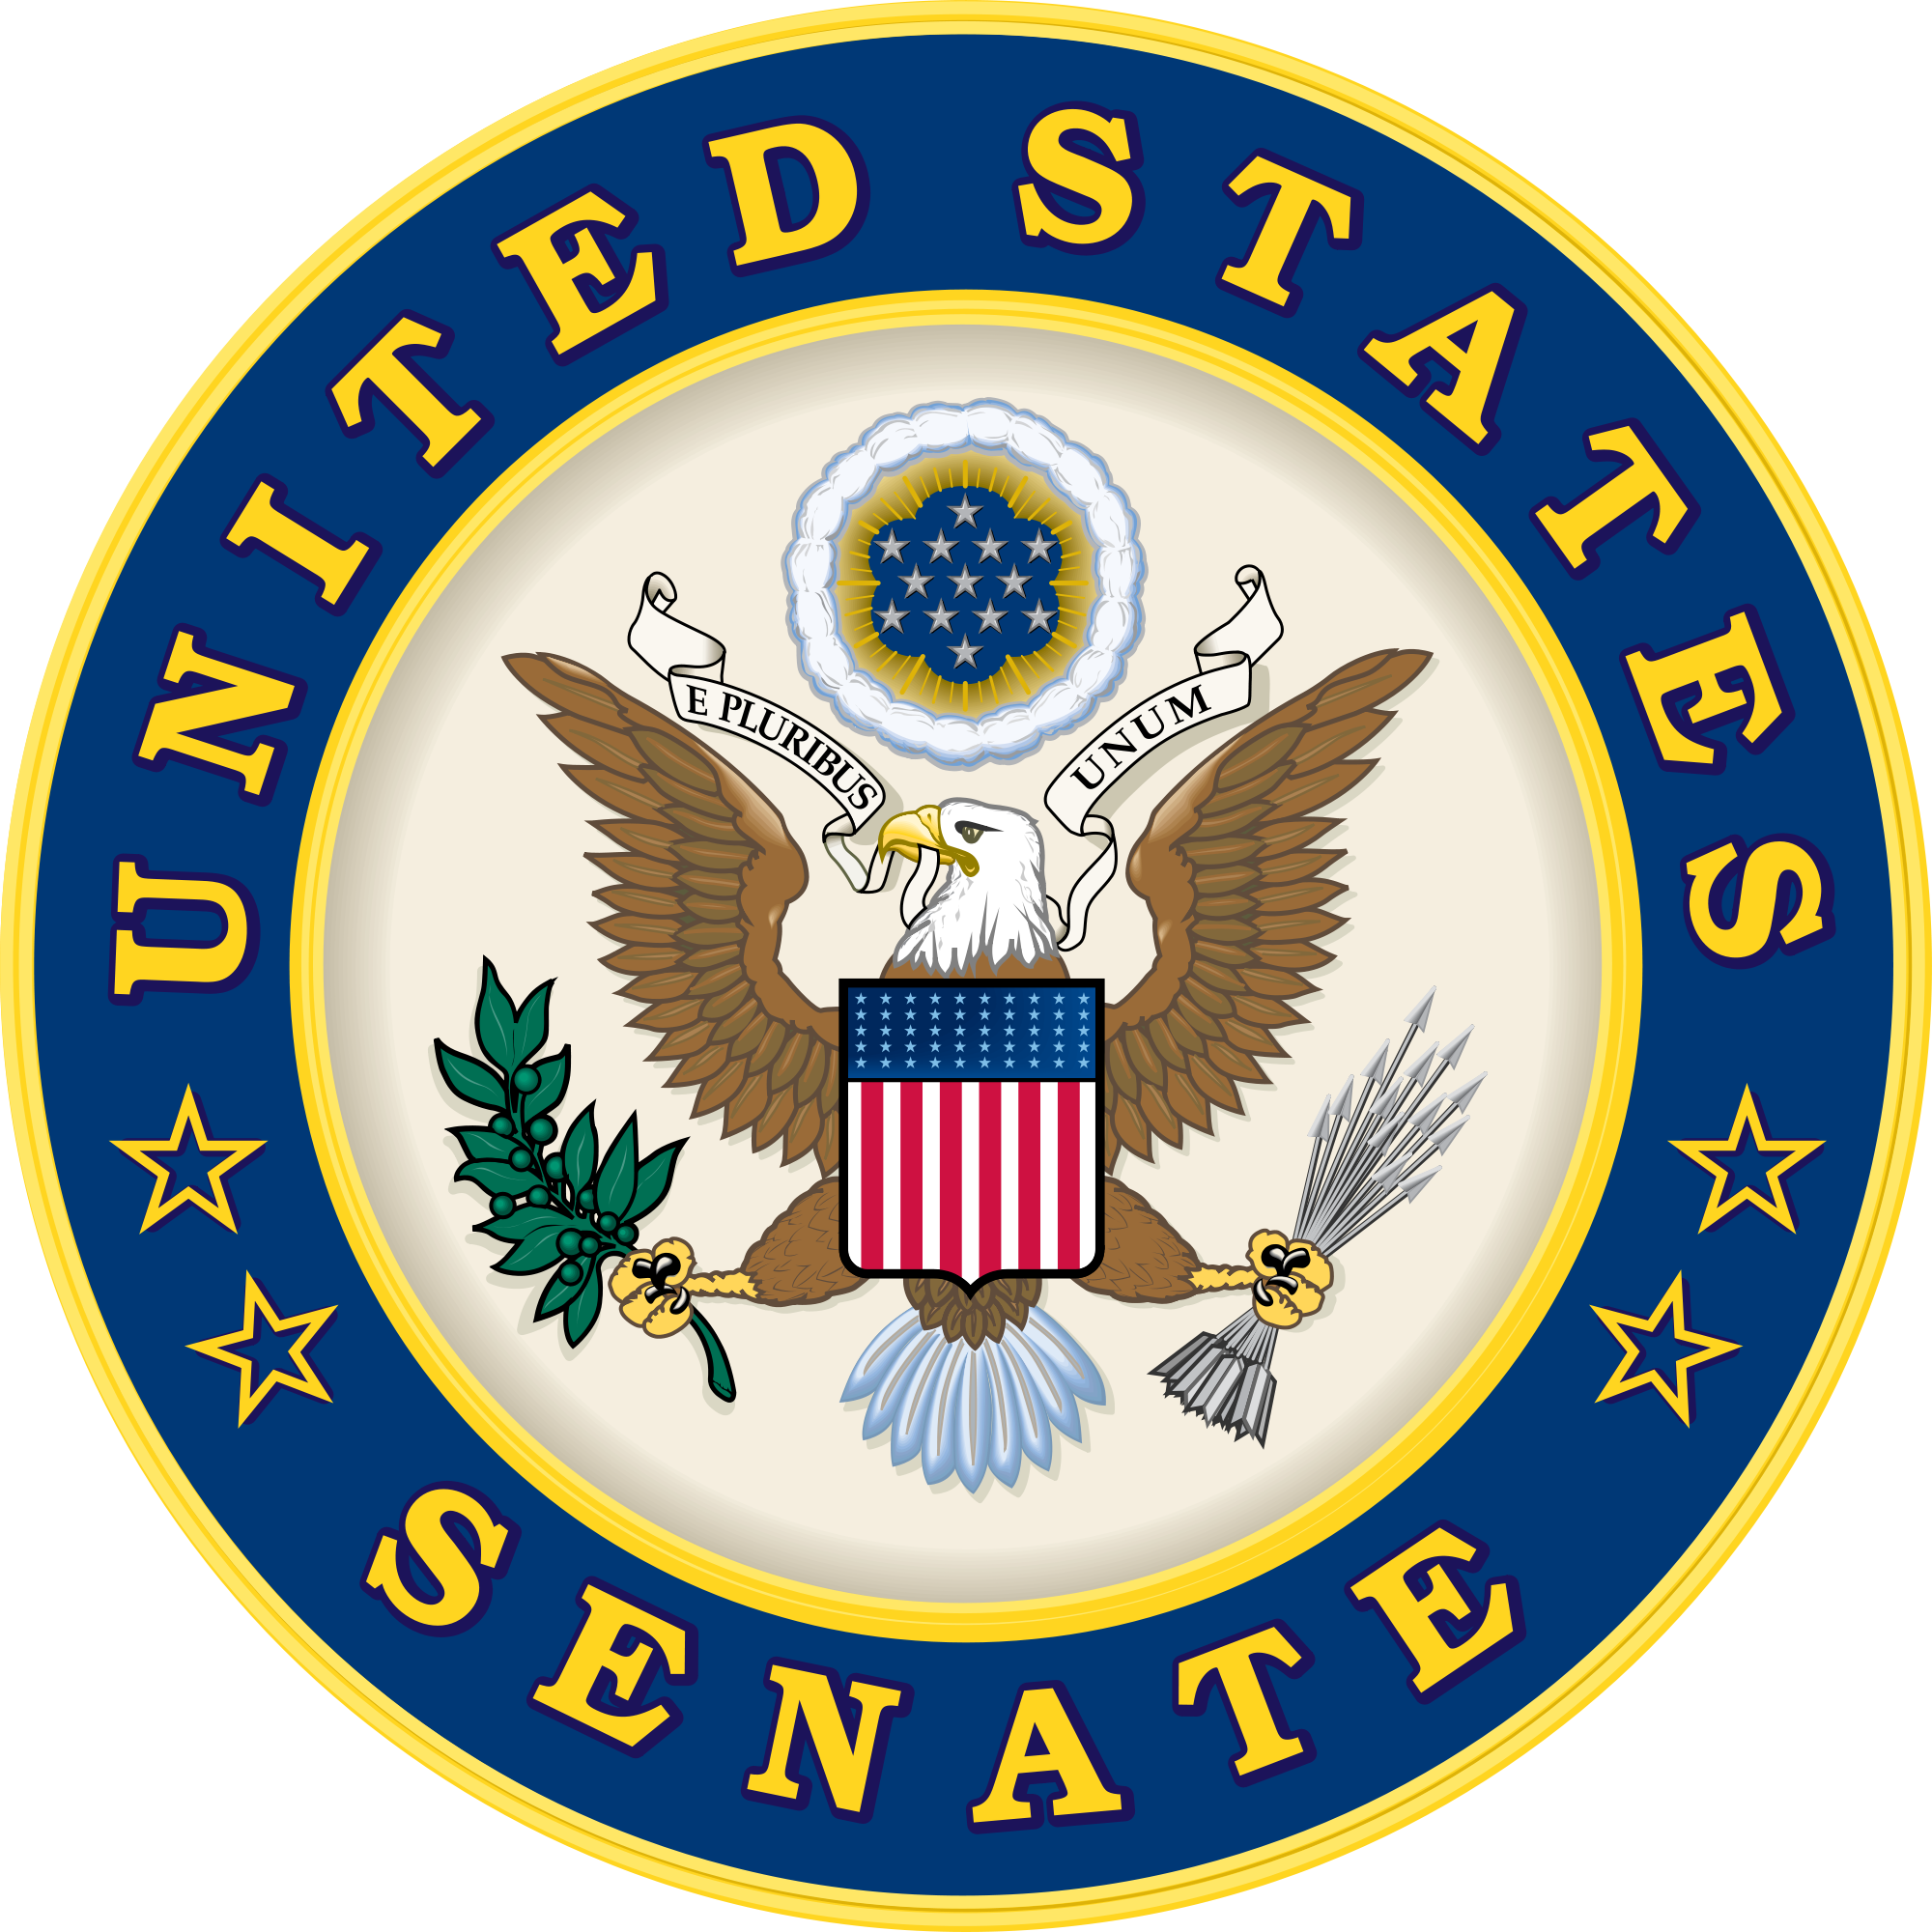 Visit senate.gov